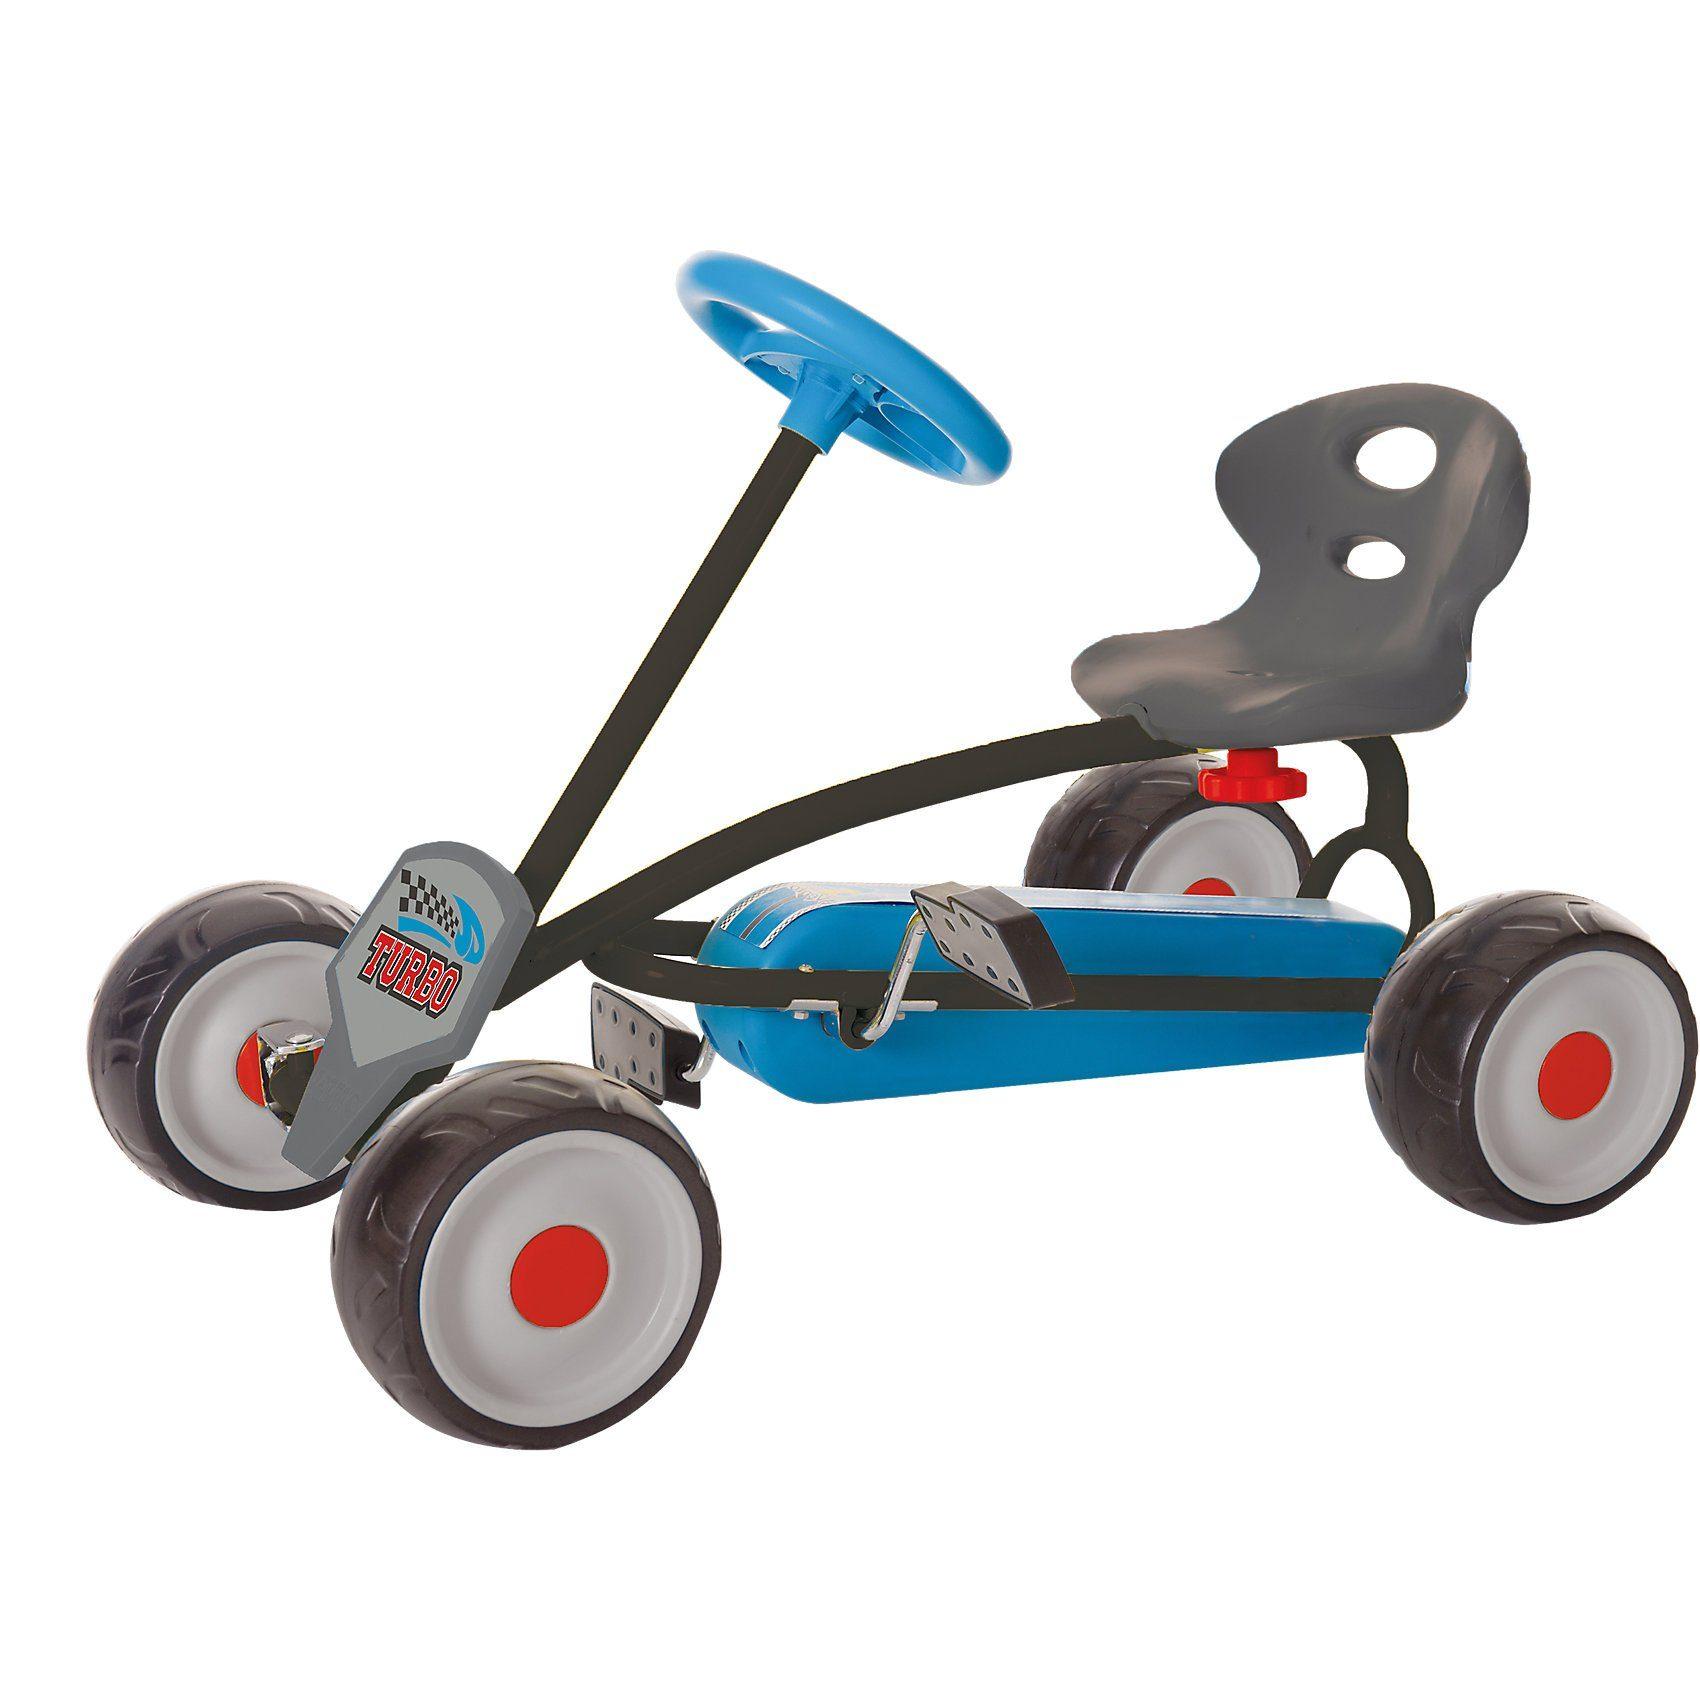 hauck Toys Turbo - Hauck Mini Go Kart Boy